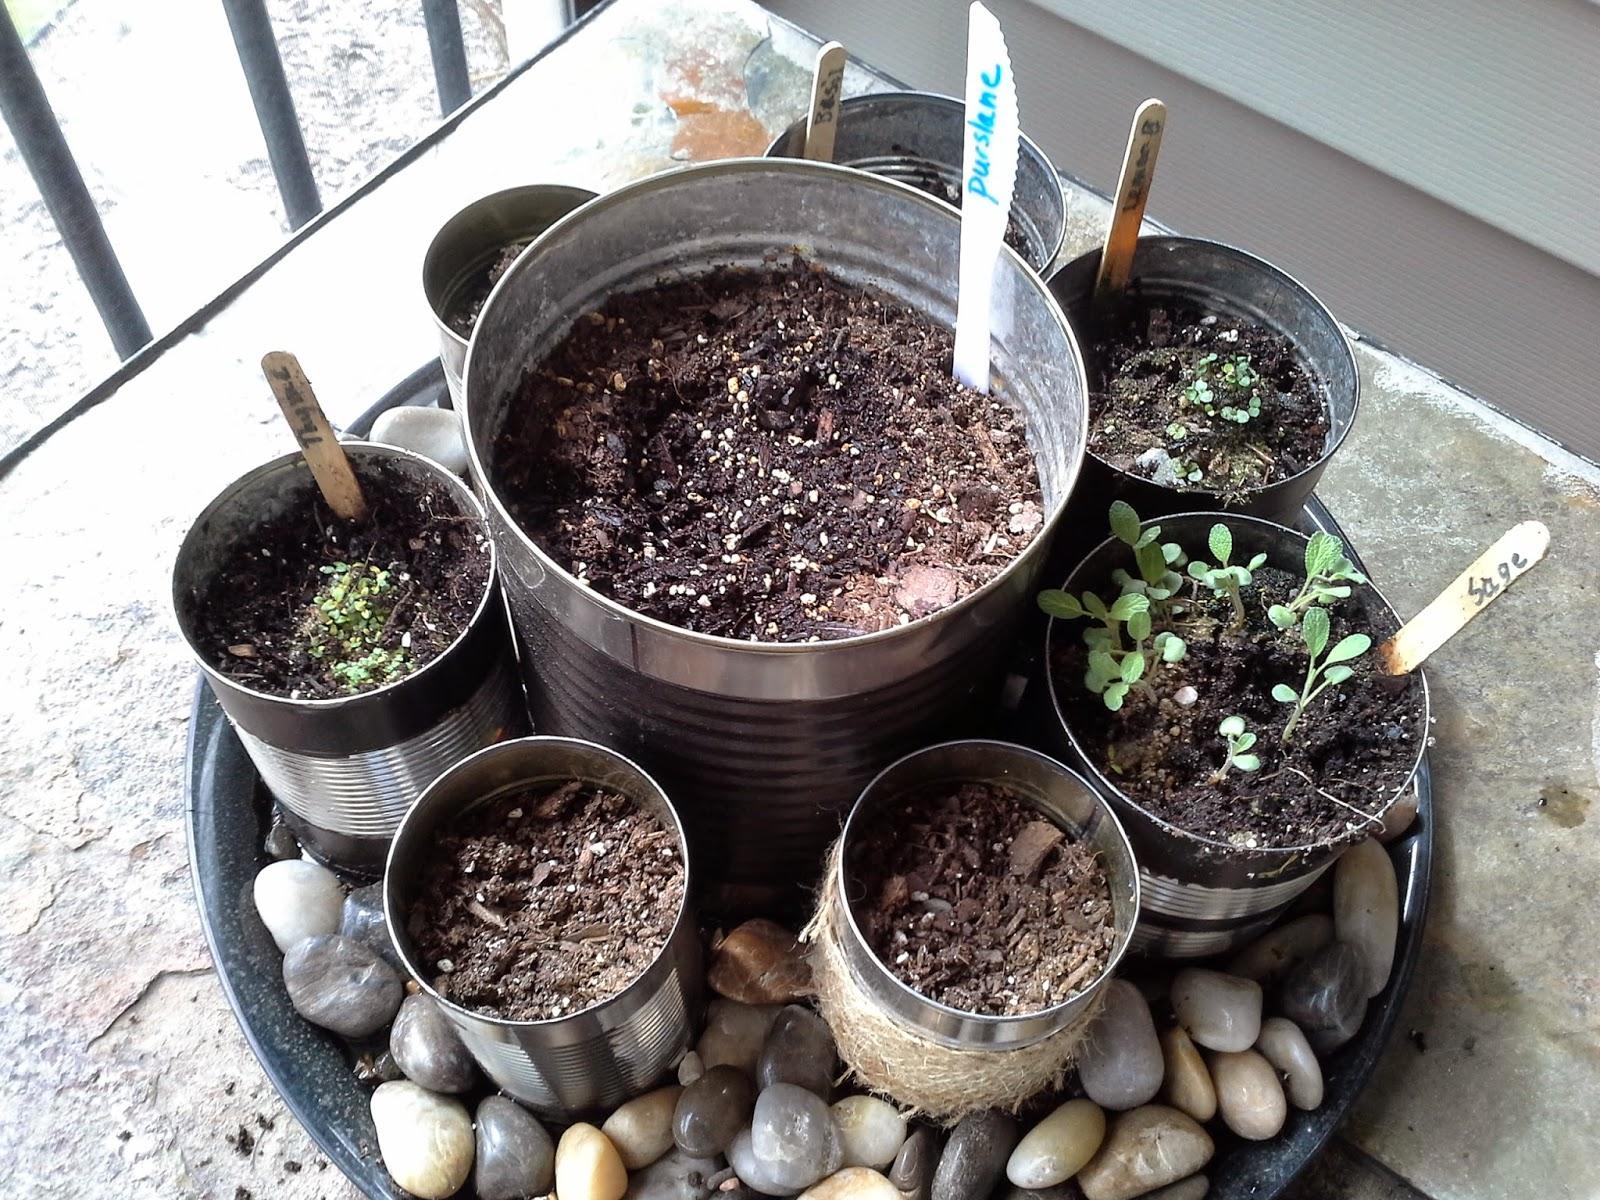 DIY herb garden easy